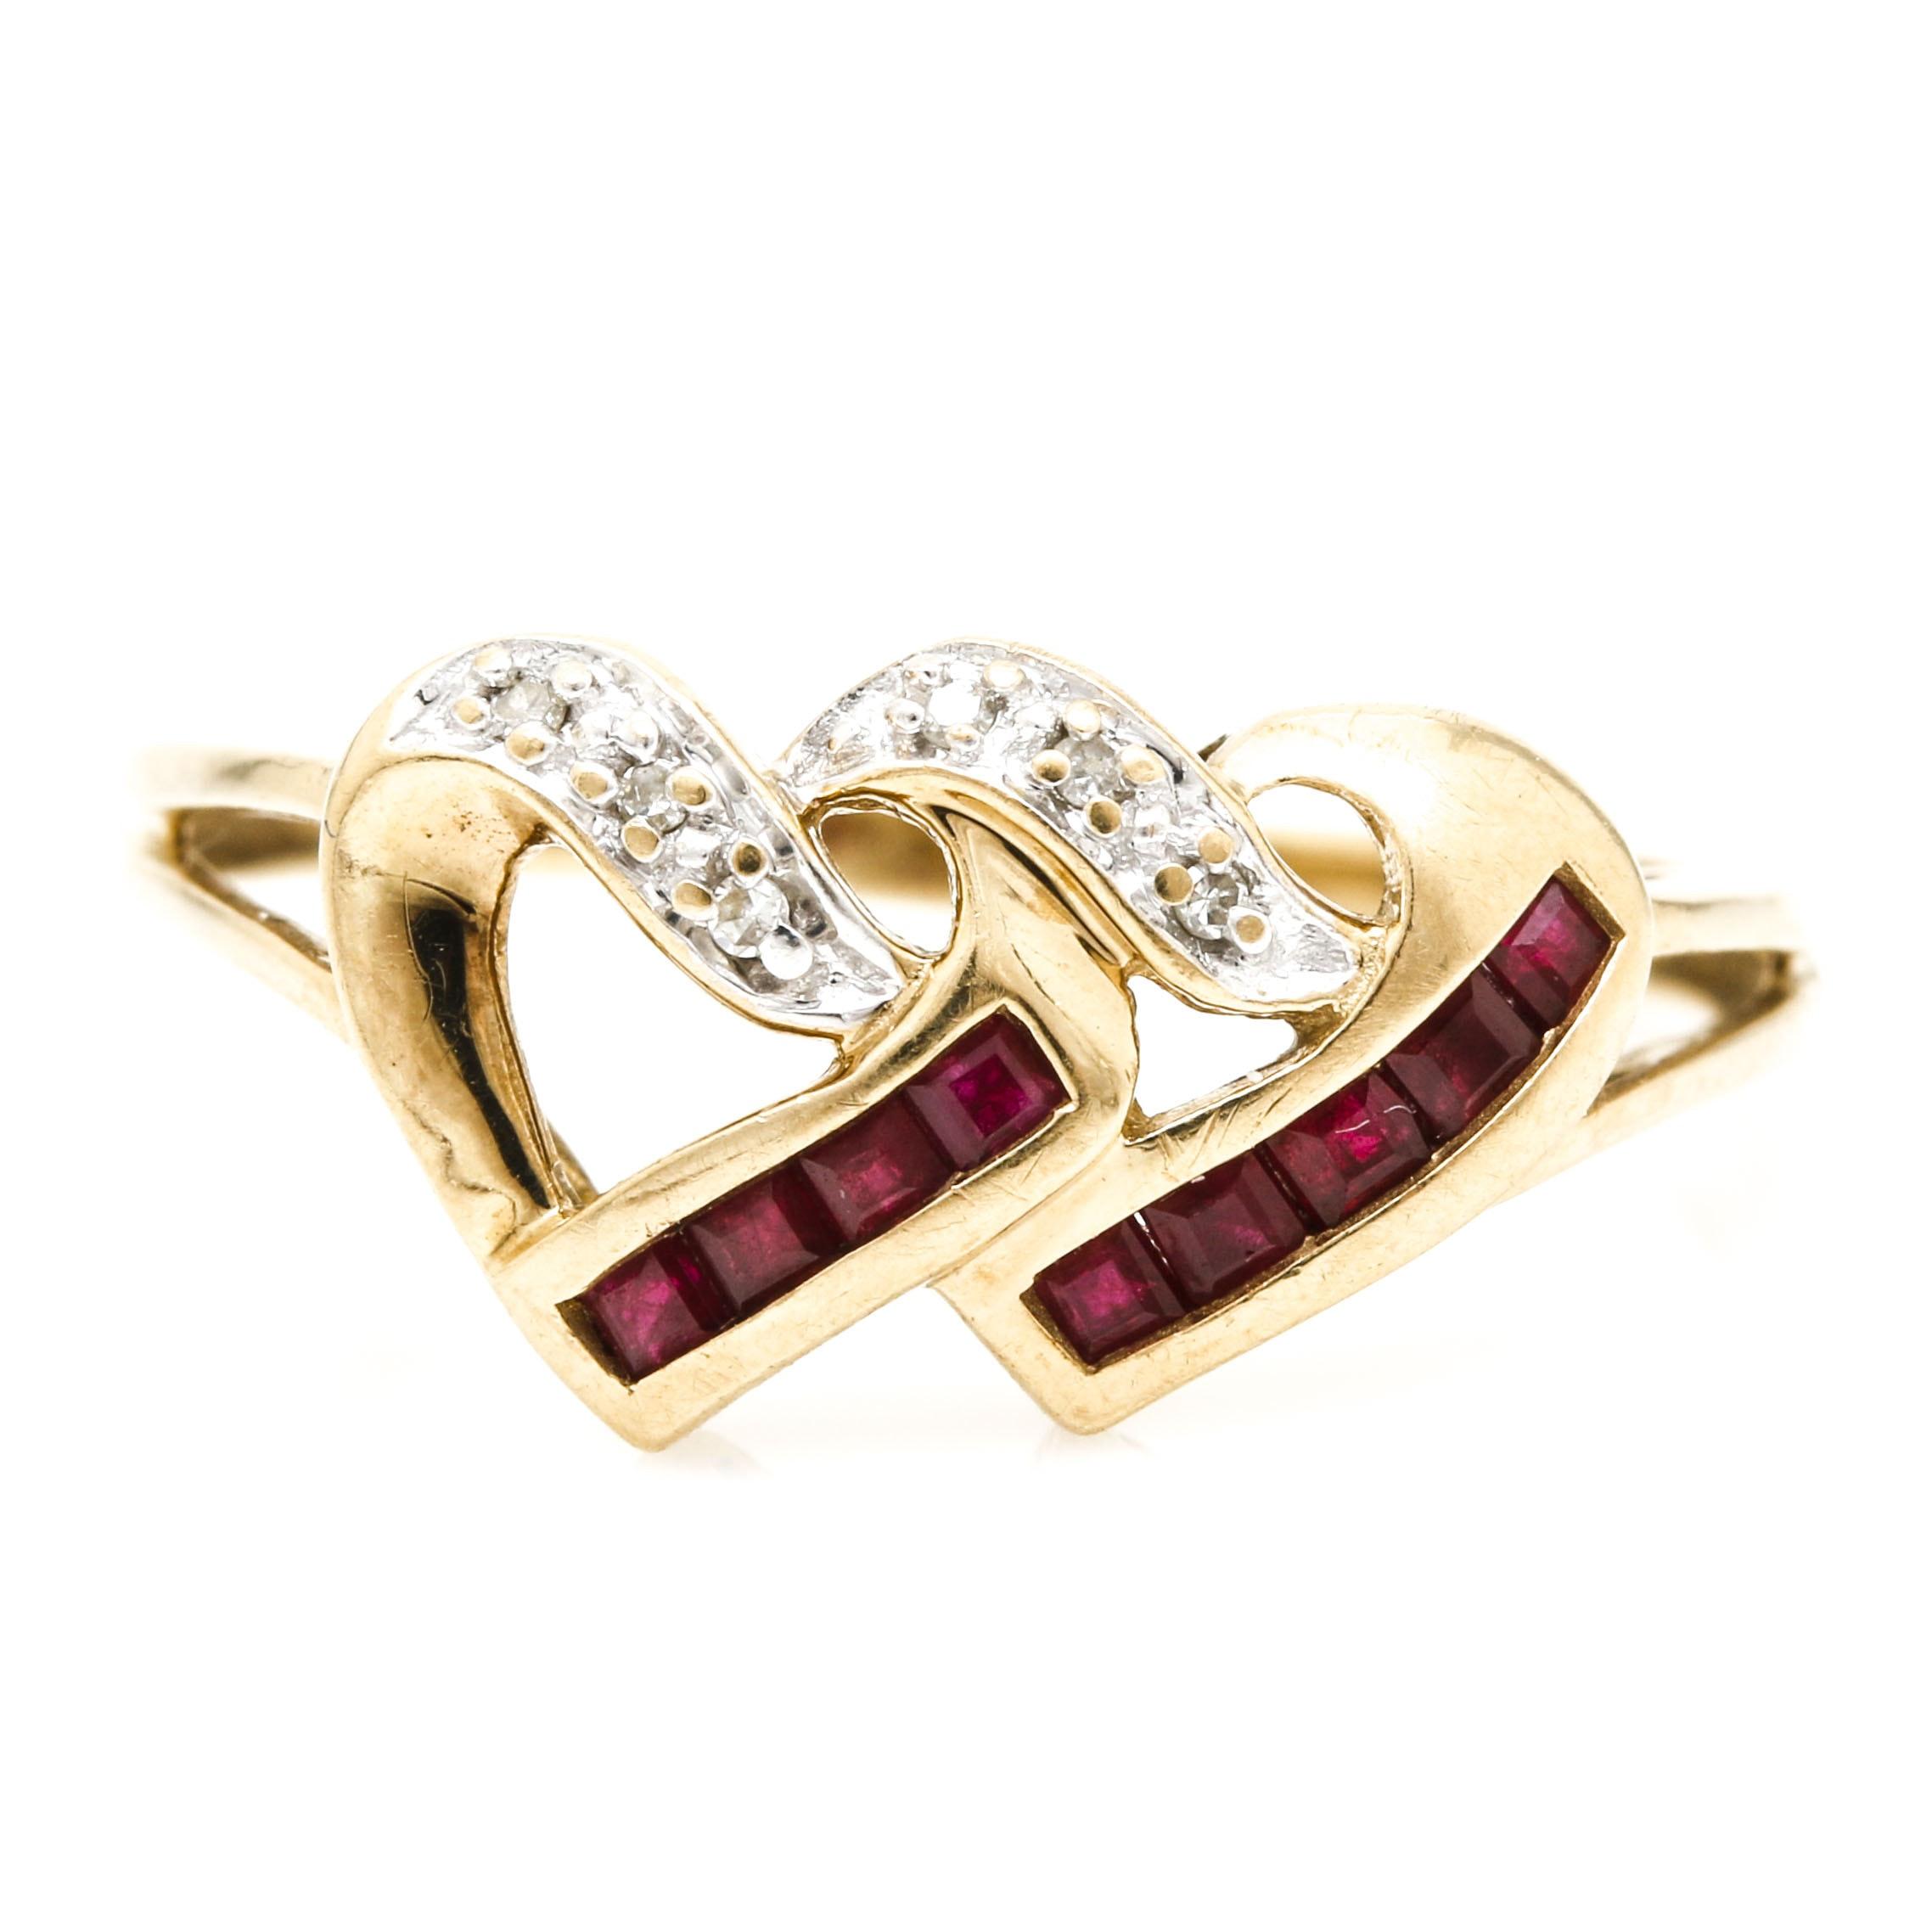 10K Yellow Gold Diamond and Ruby Interlocking Hearts Ring